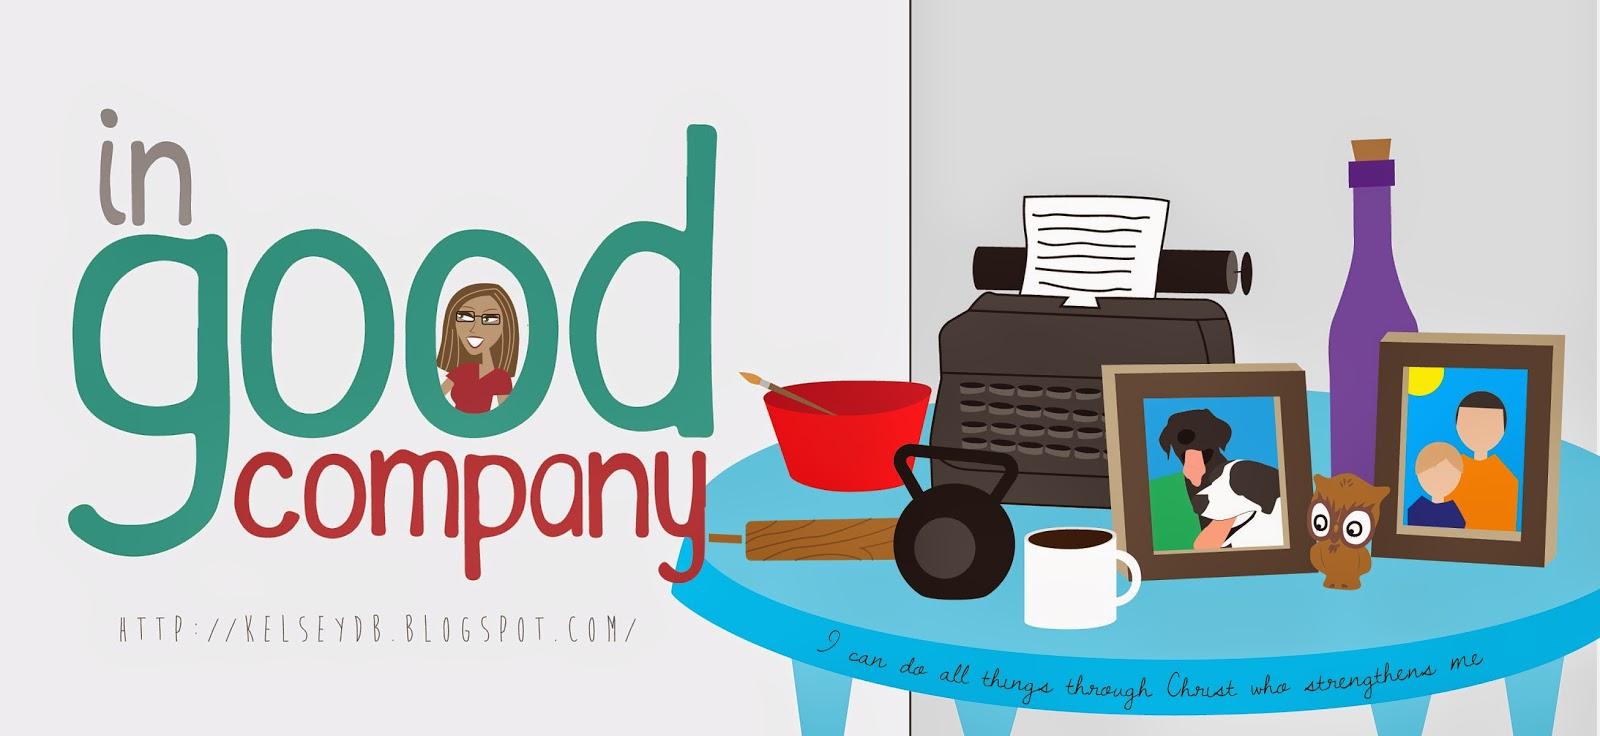 In Good Company - Kelsey Butcher blog